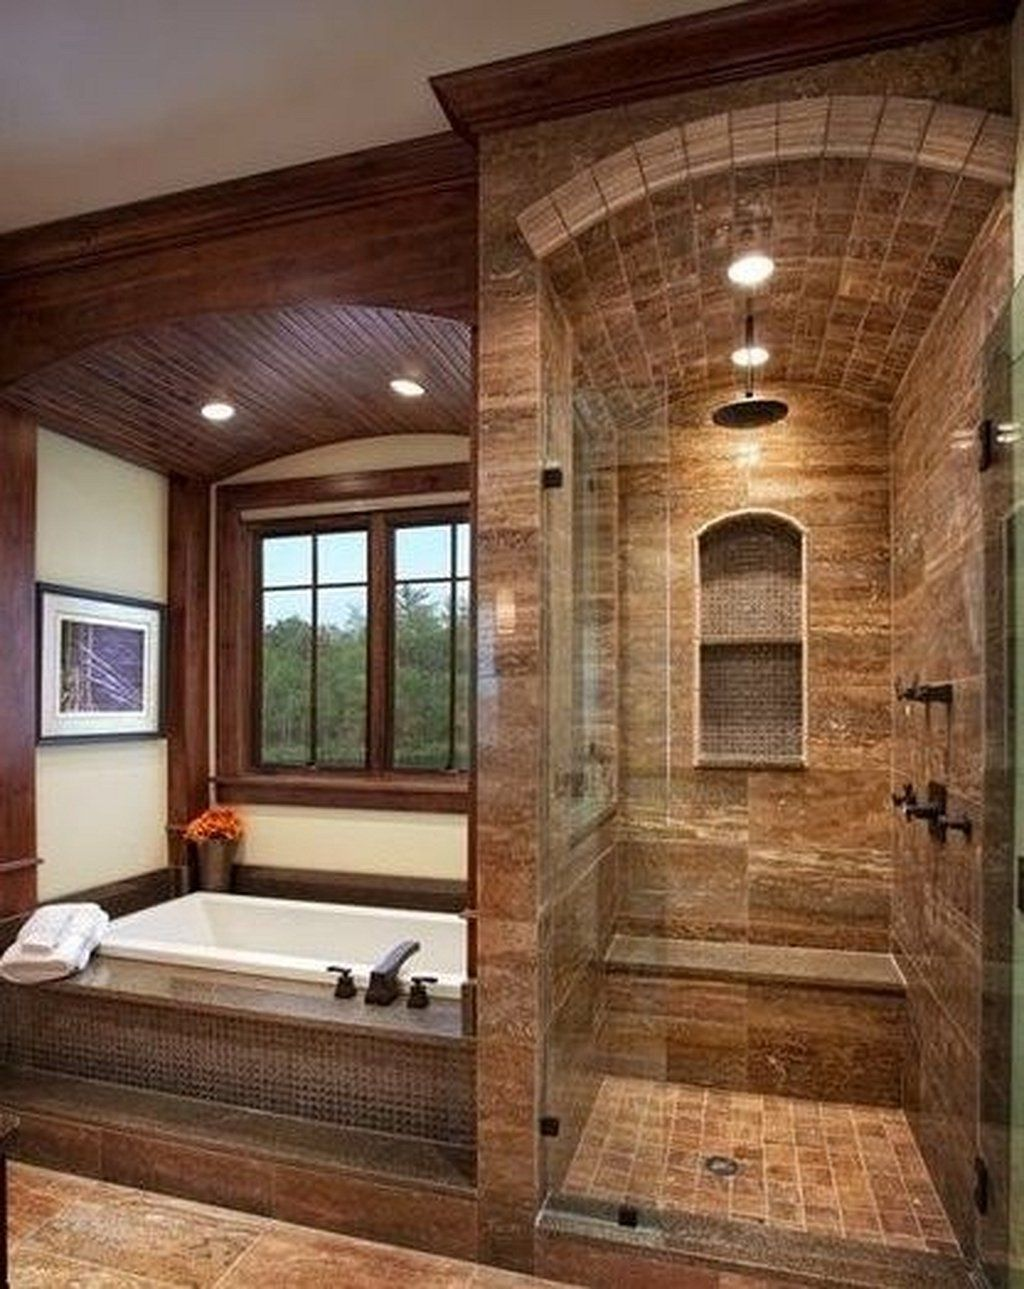 Master Bathroom Walk In Shower Ideas | Dream bathrooms ...